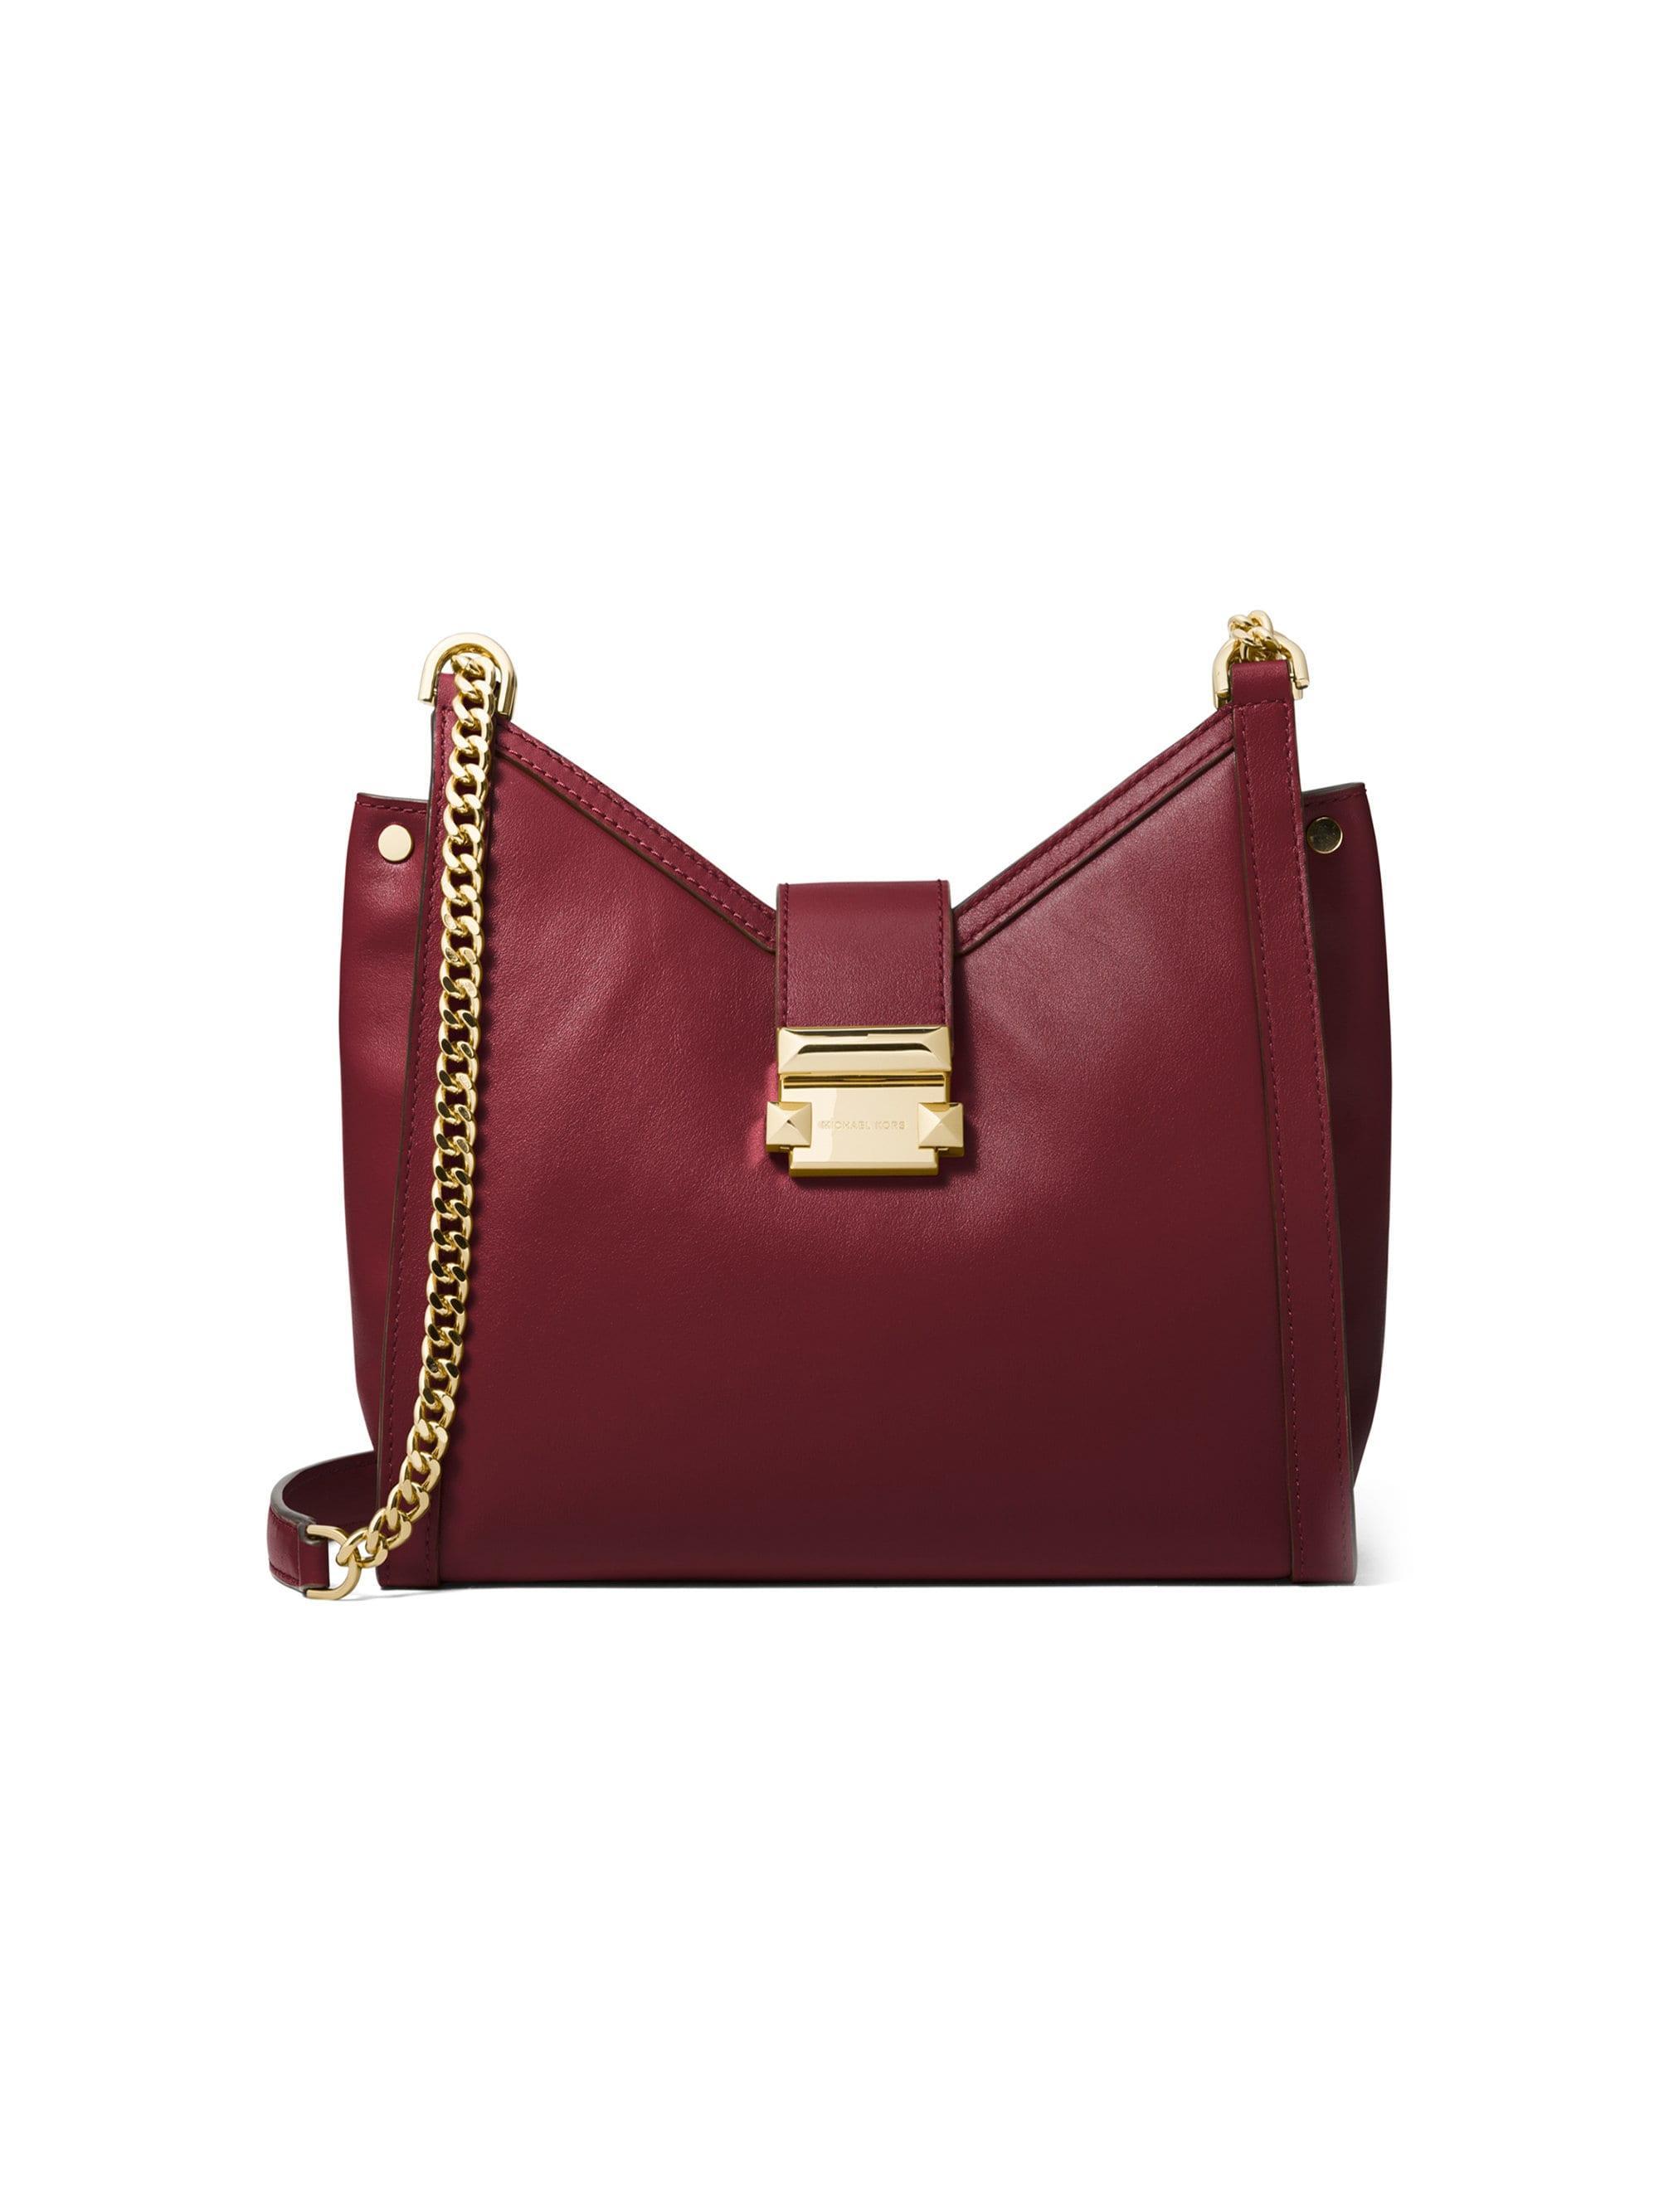 4957a8963a3e59 MICHAEL Michael Kors. Women's Whitney Small Leather Crossbody Bag ...